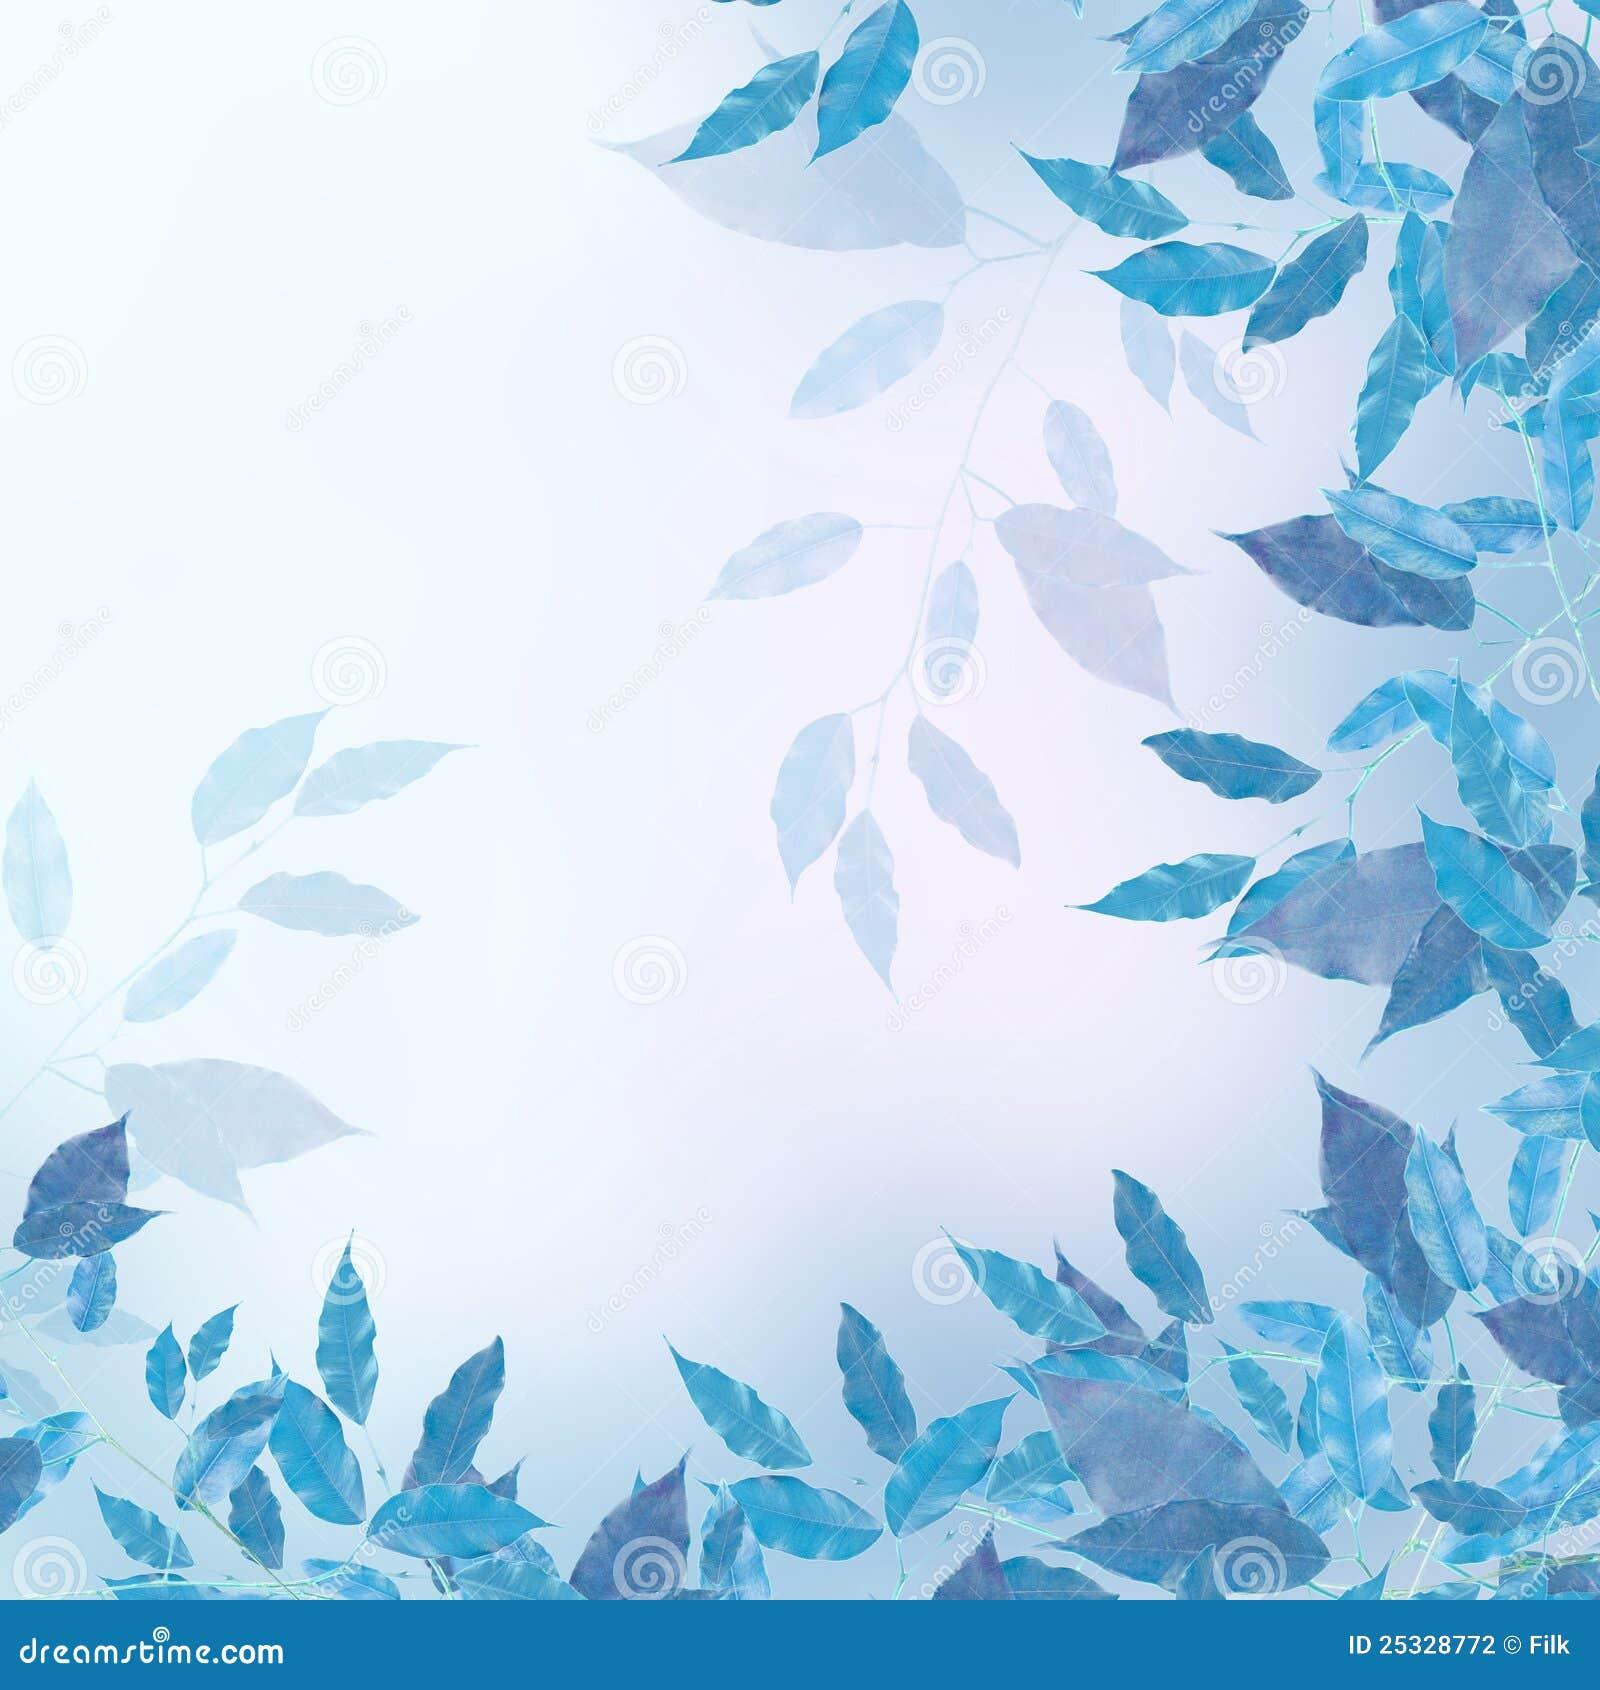 Blue Leaves Border Stock Photography - Image: 25328772